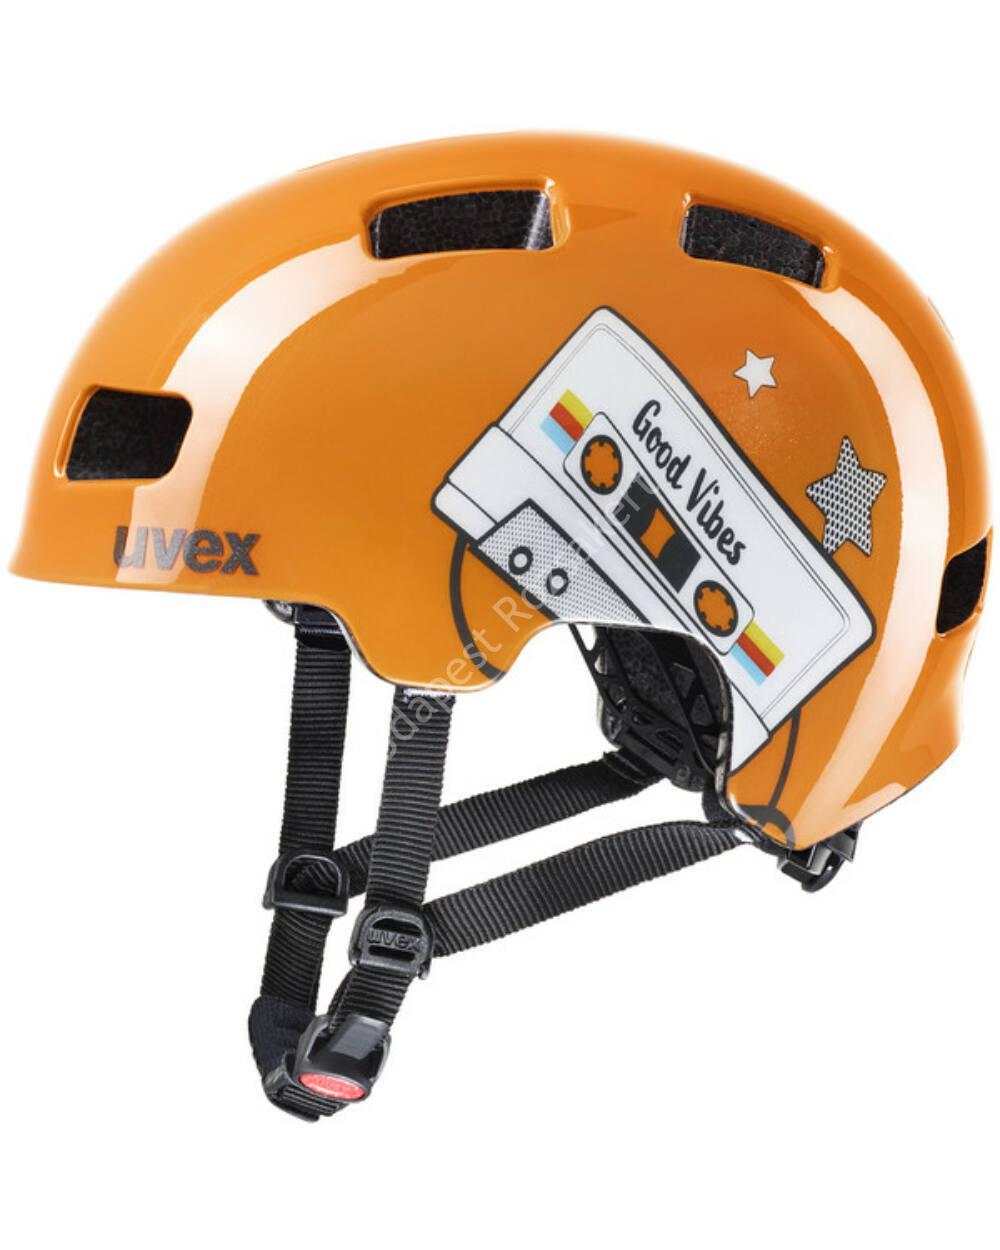 Uvex Hlmt 4 orange tape bukósisak, 51-55 cm